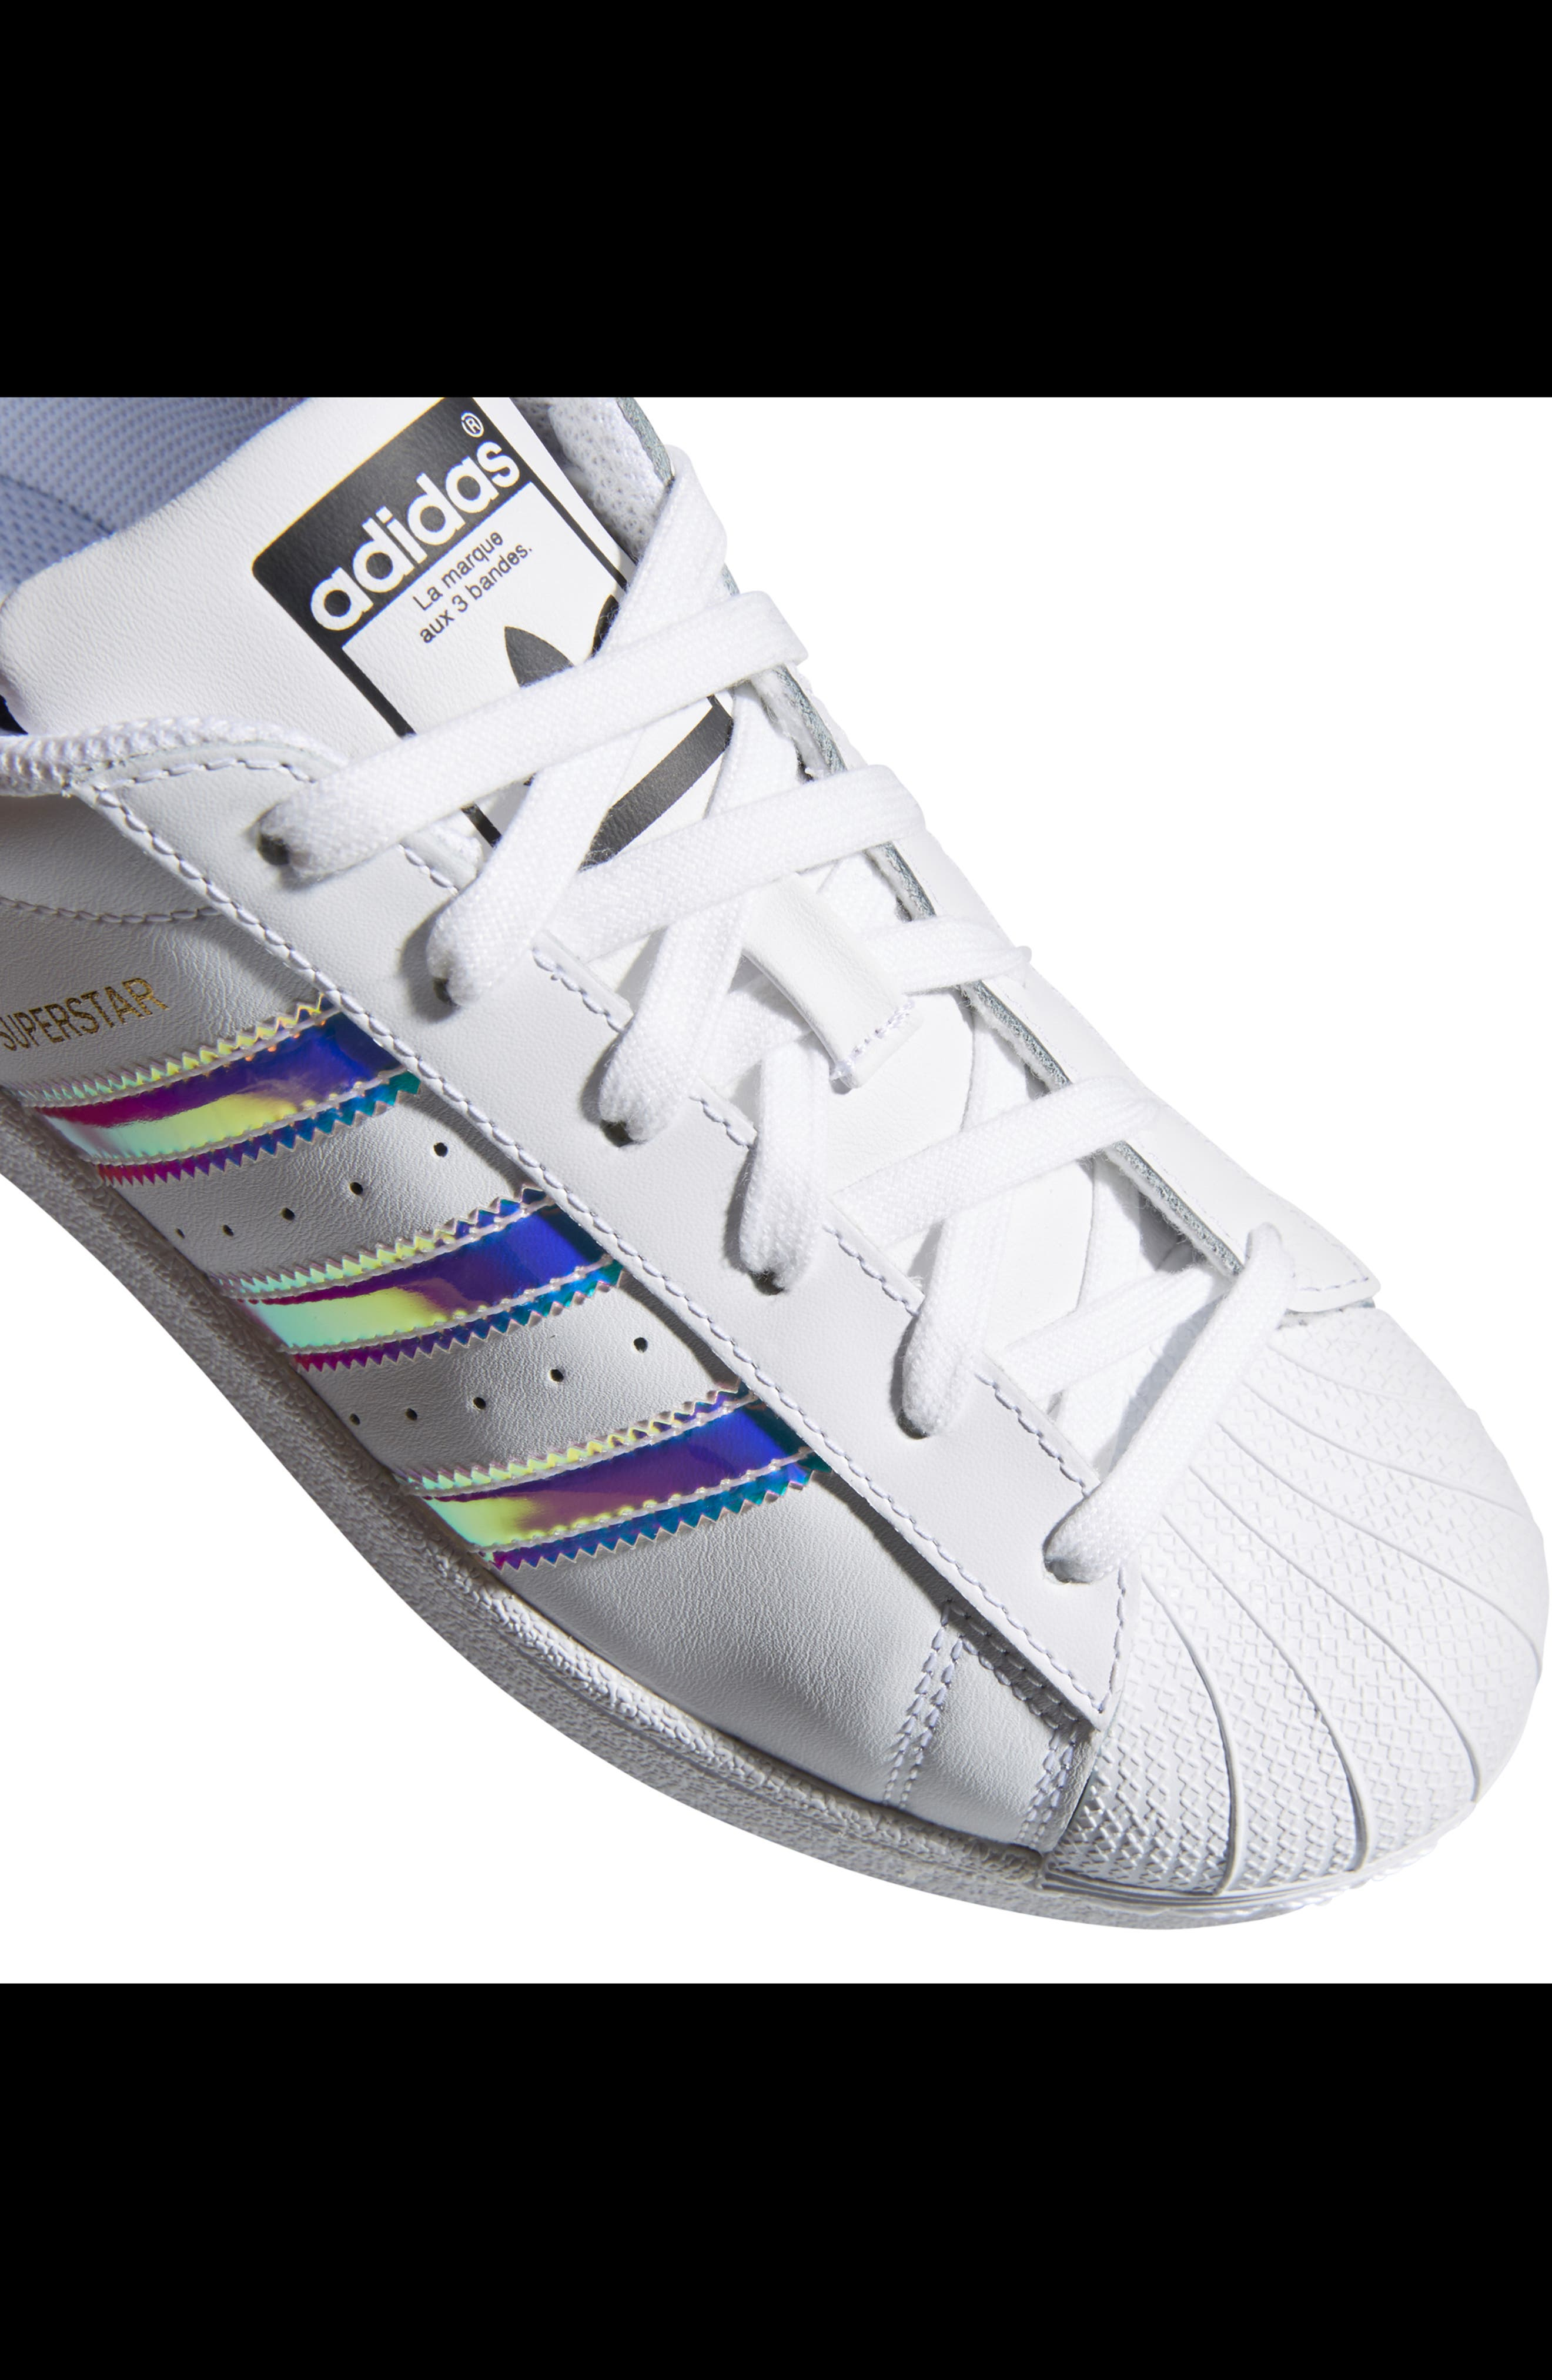 Superstar - Iridescent Sneaker,                             Alternate thumbnail 14, color,                             SILVER METALLIC/ WHITE